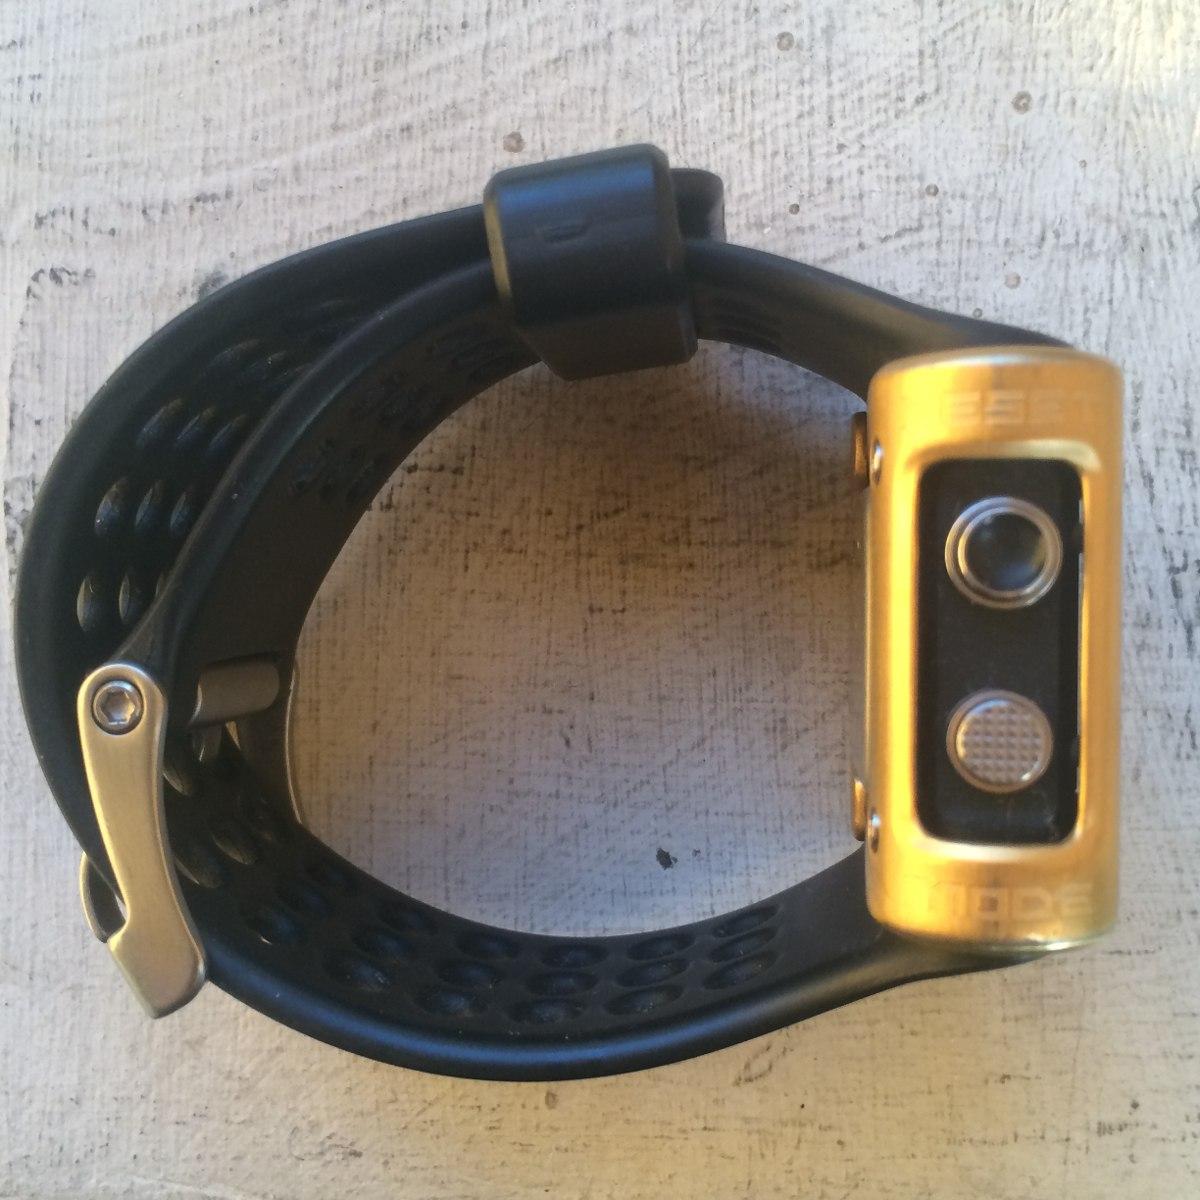 92e7790ec12 relógio nike cage gold black wc-0071 importado aceito trocas. Carregando  zoom.